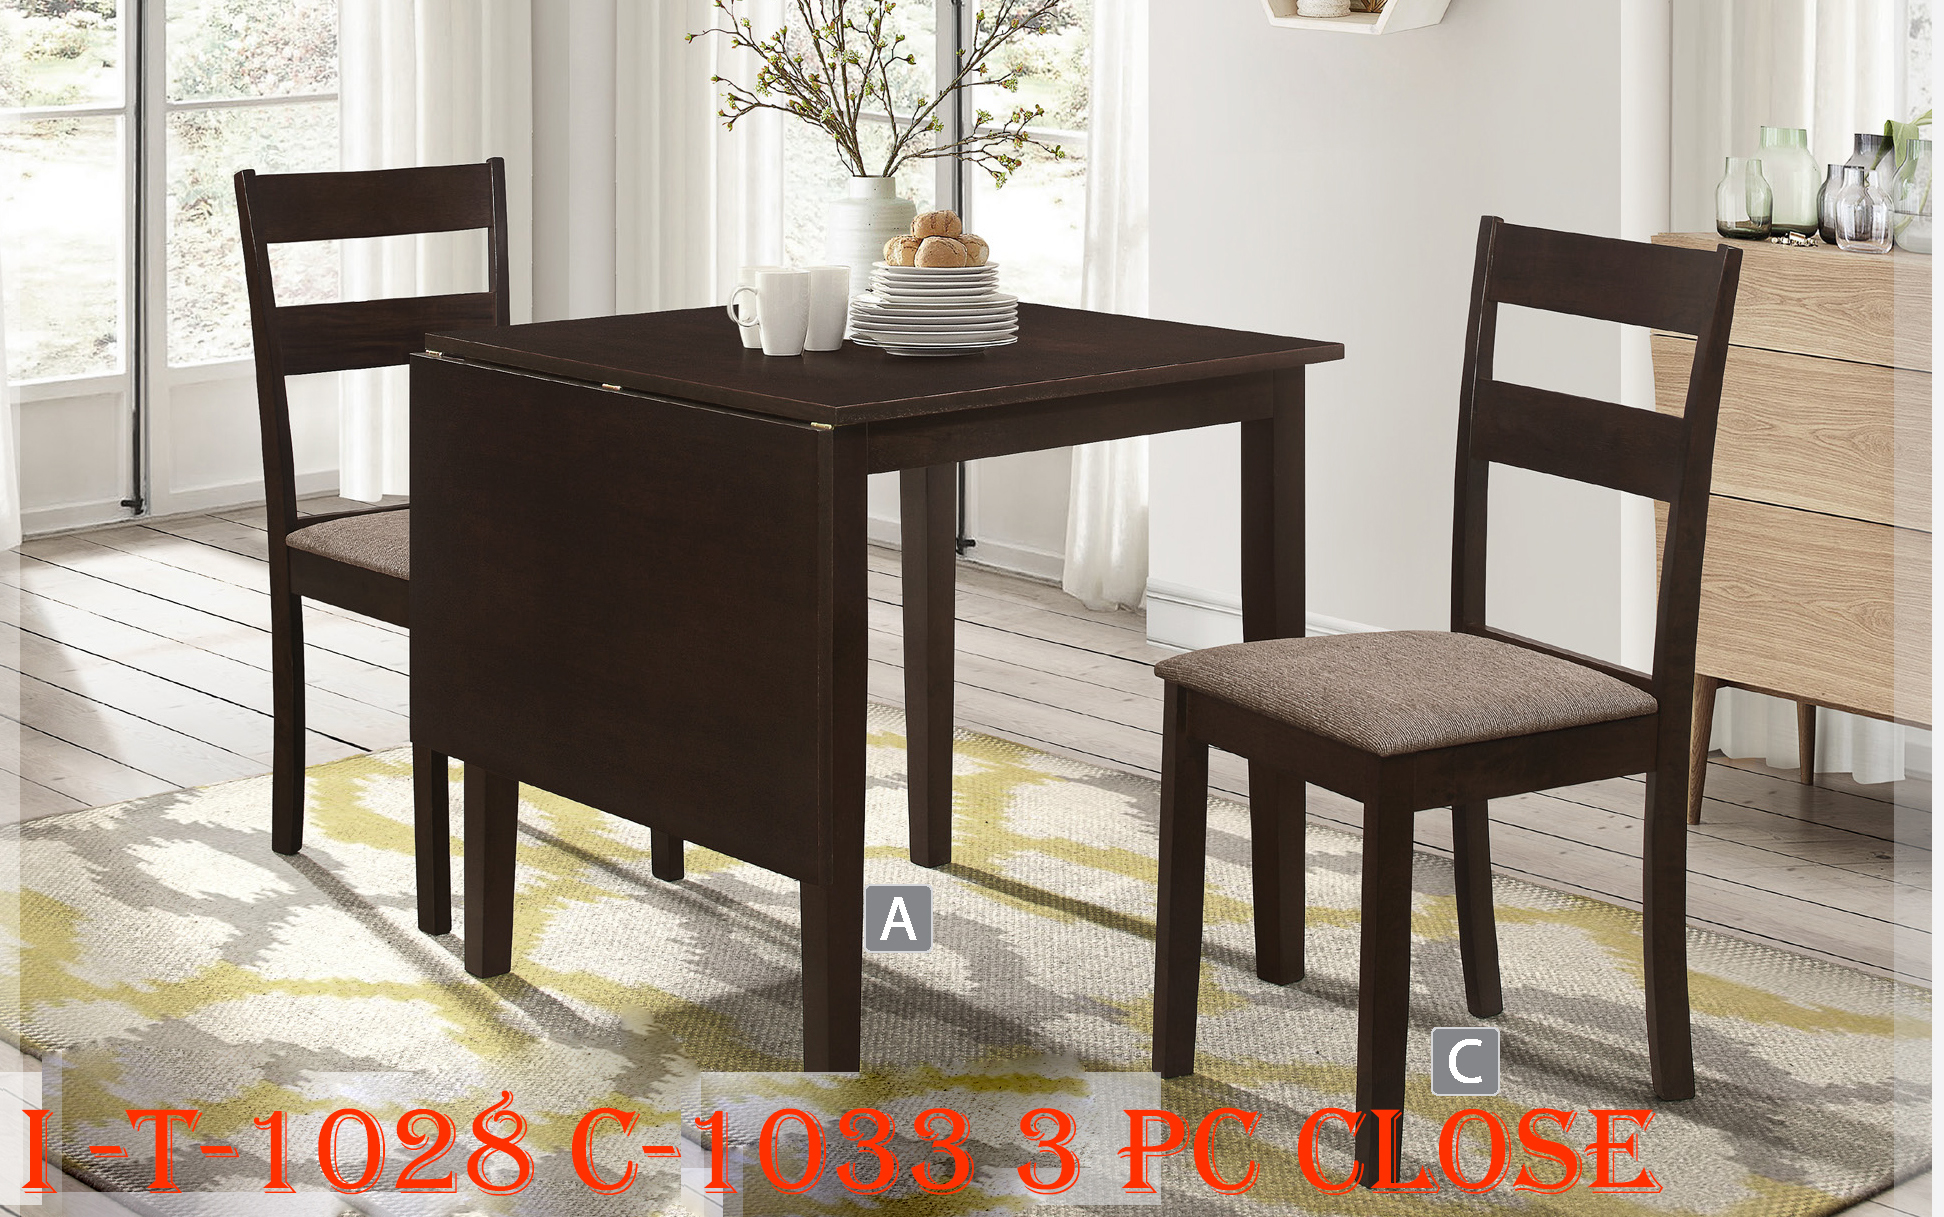 I-T-1028 C-1033 3 PC CLOSE